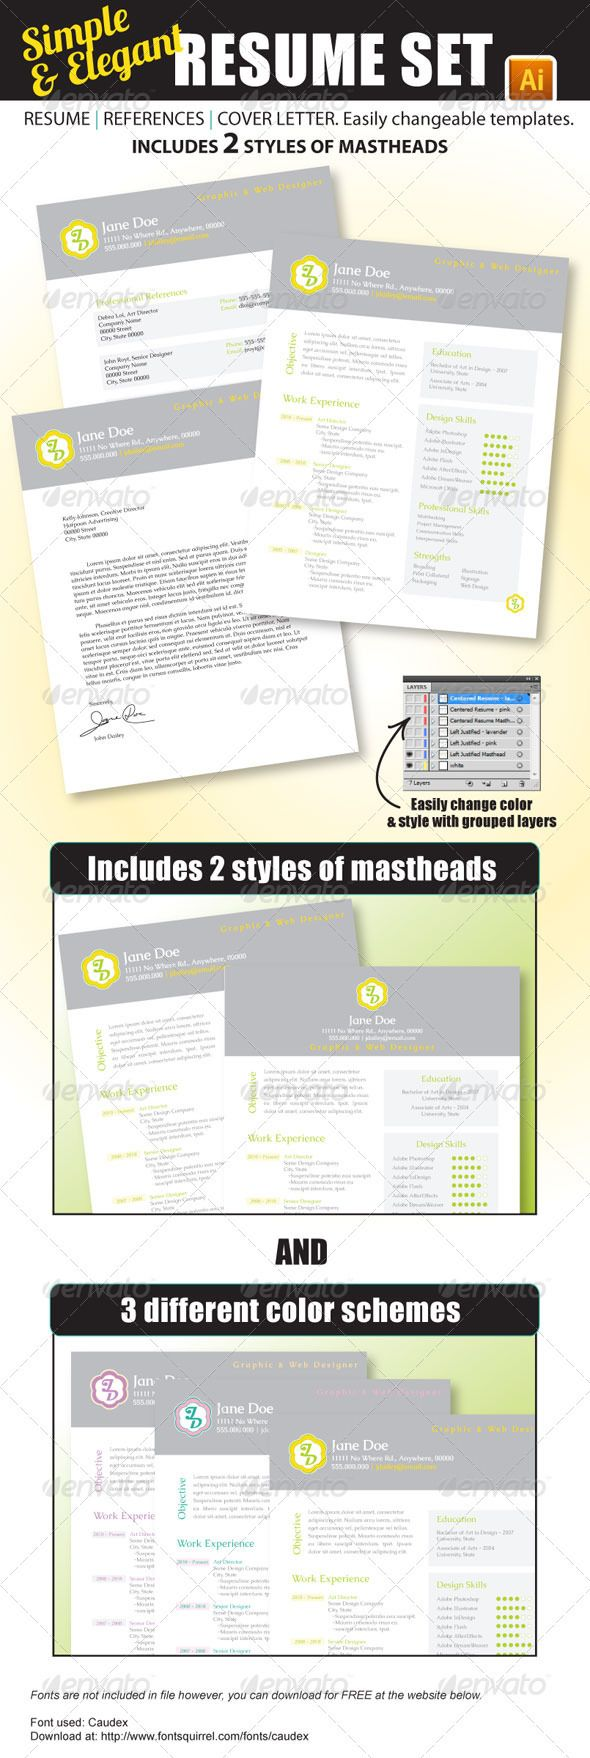 Best Resume Color Scheme